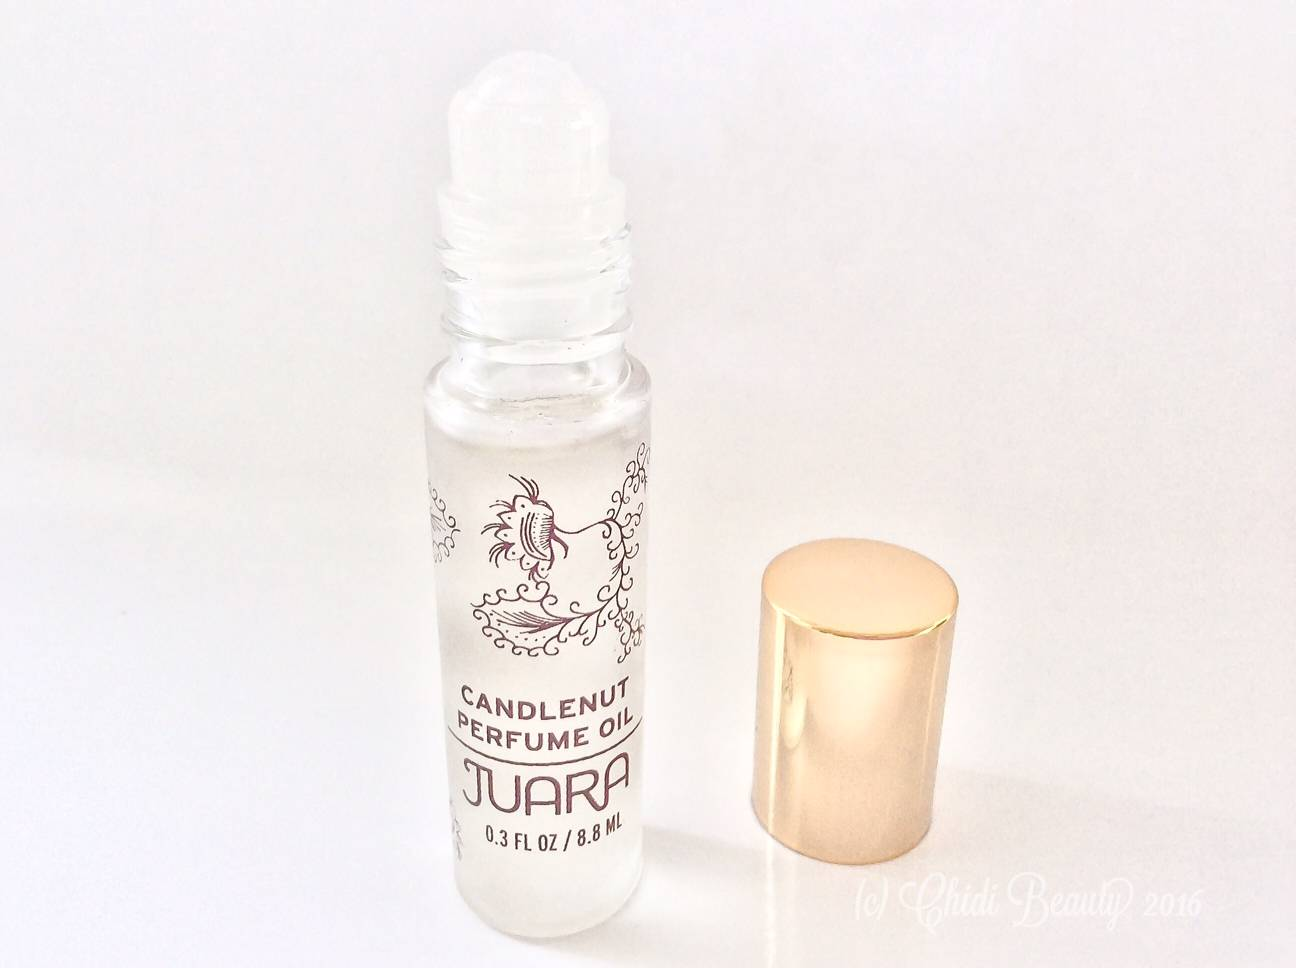 Juara Candlenut Perfume Oil Rollerball • chidibeauty.com